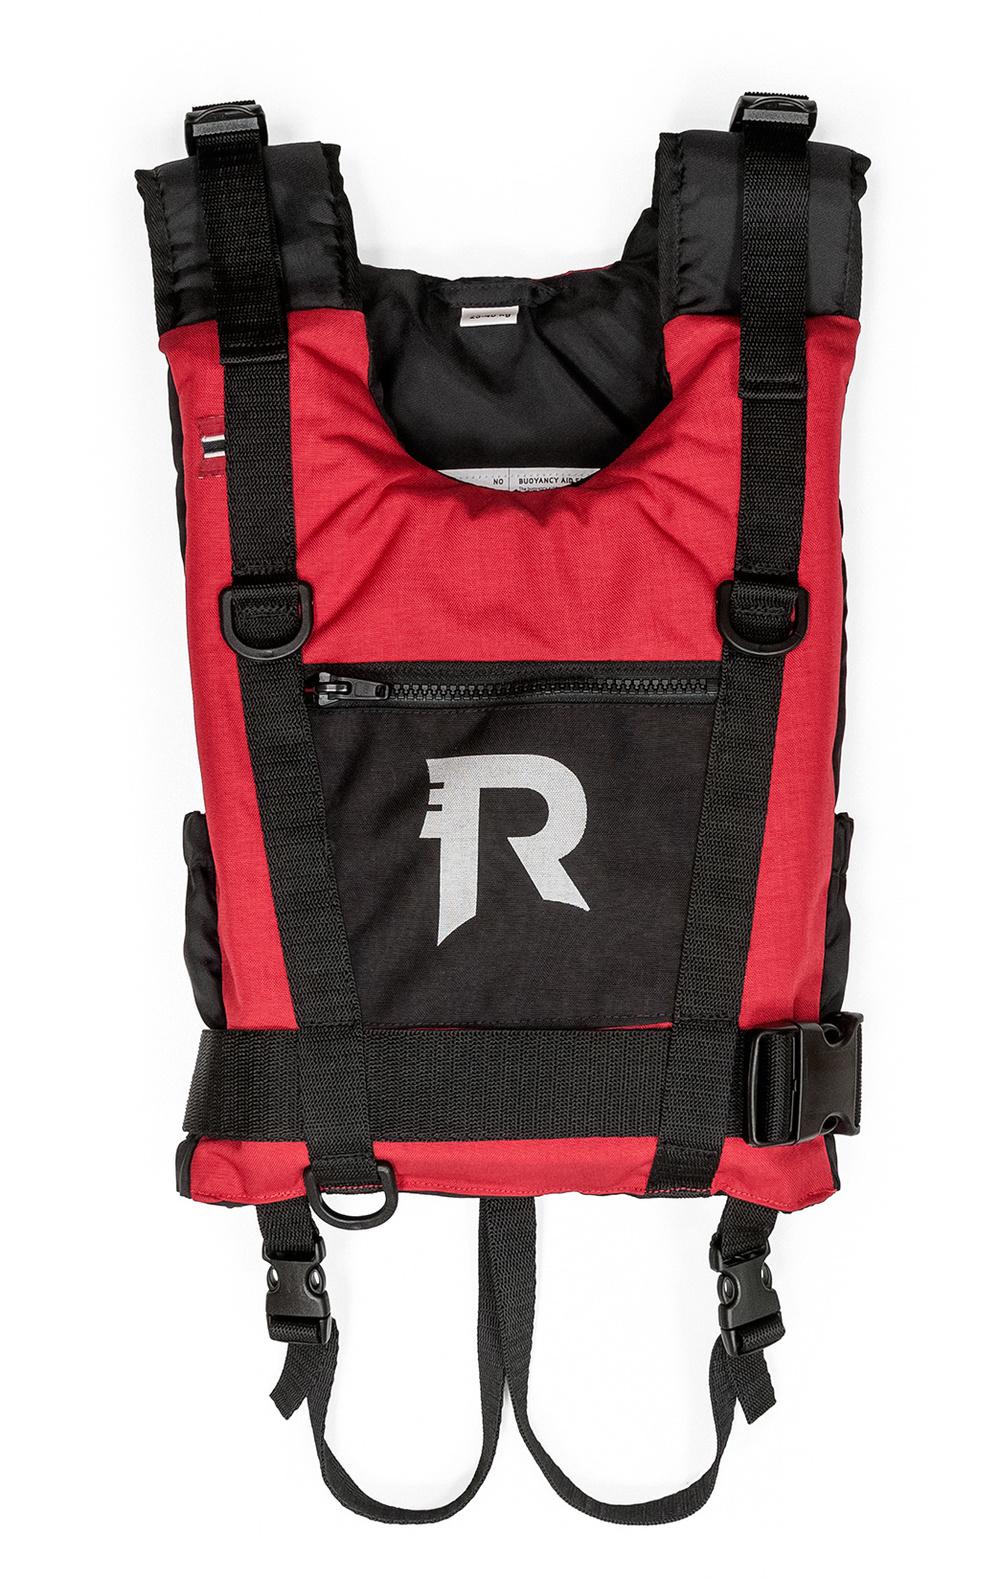 Regatta-Action-explorer-junior-red-front.jpg